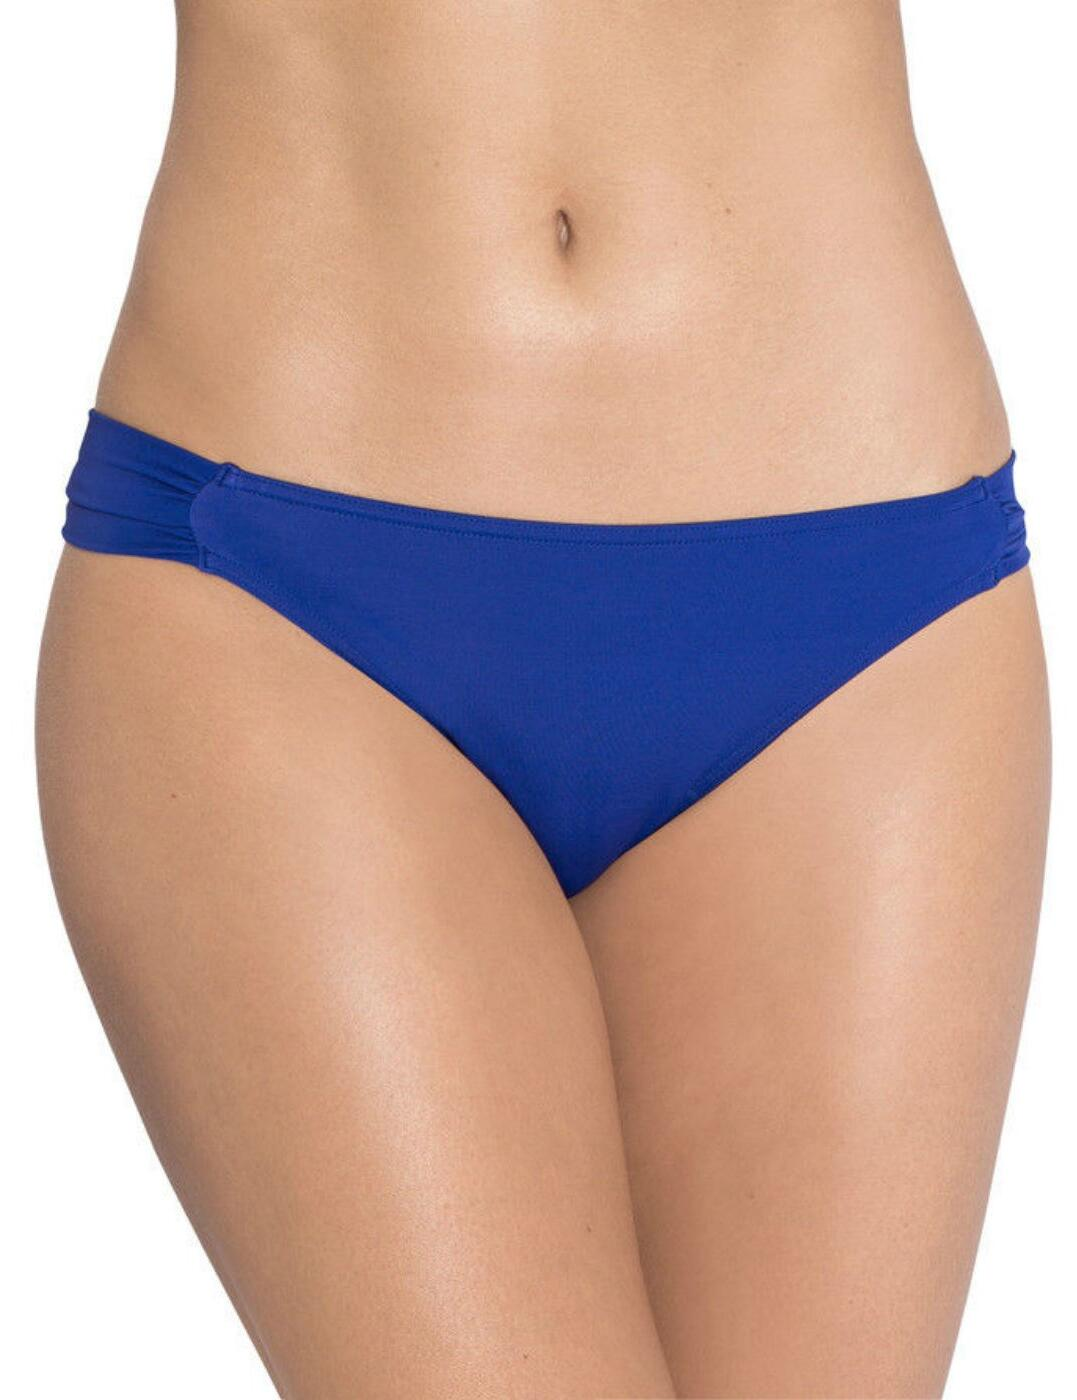 10166386 Sloggi Swim Aqua Essentials Bikini Brief Blue - 10166386 Blue